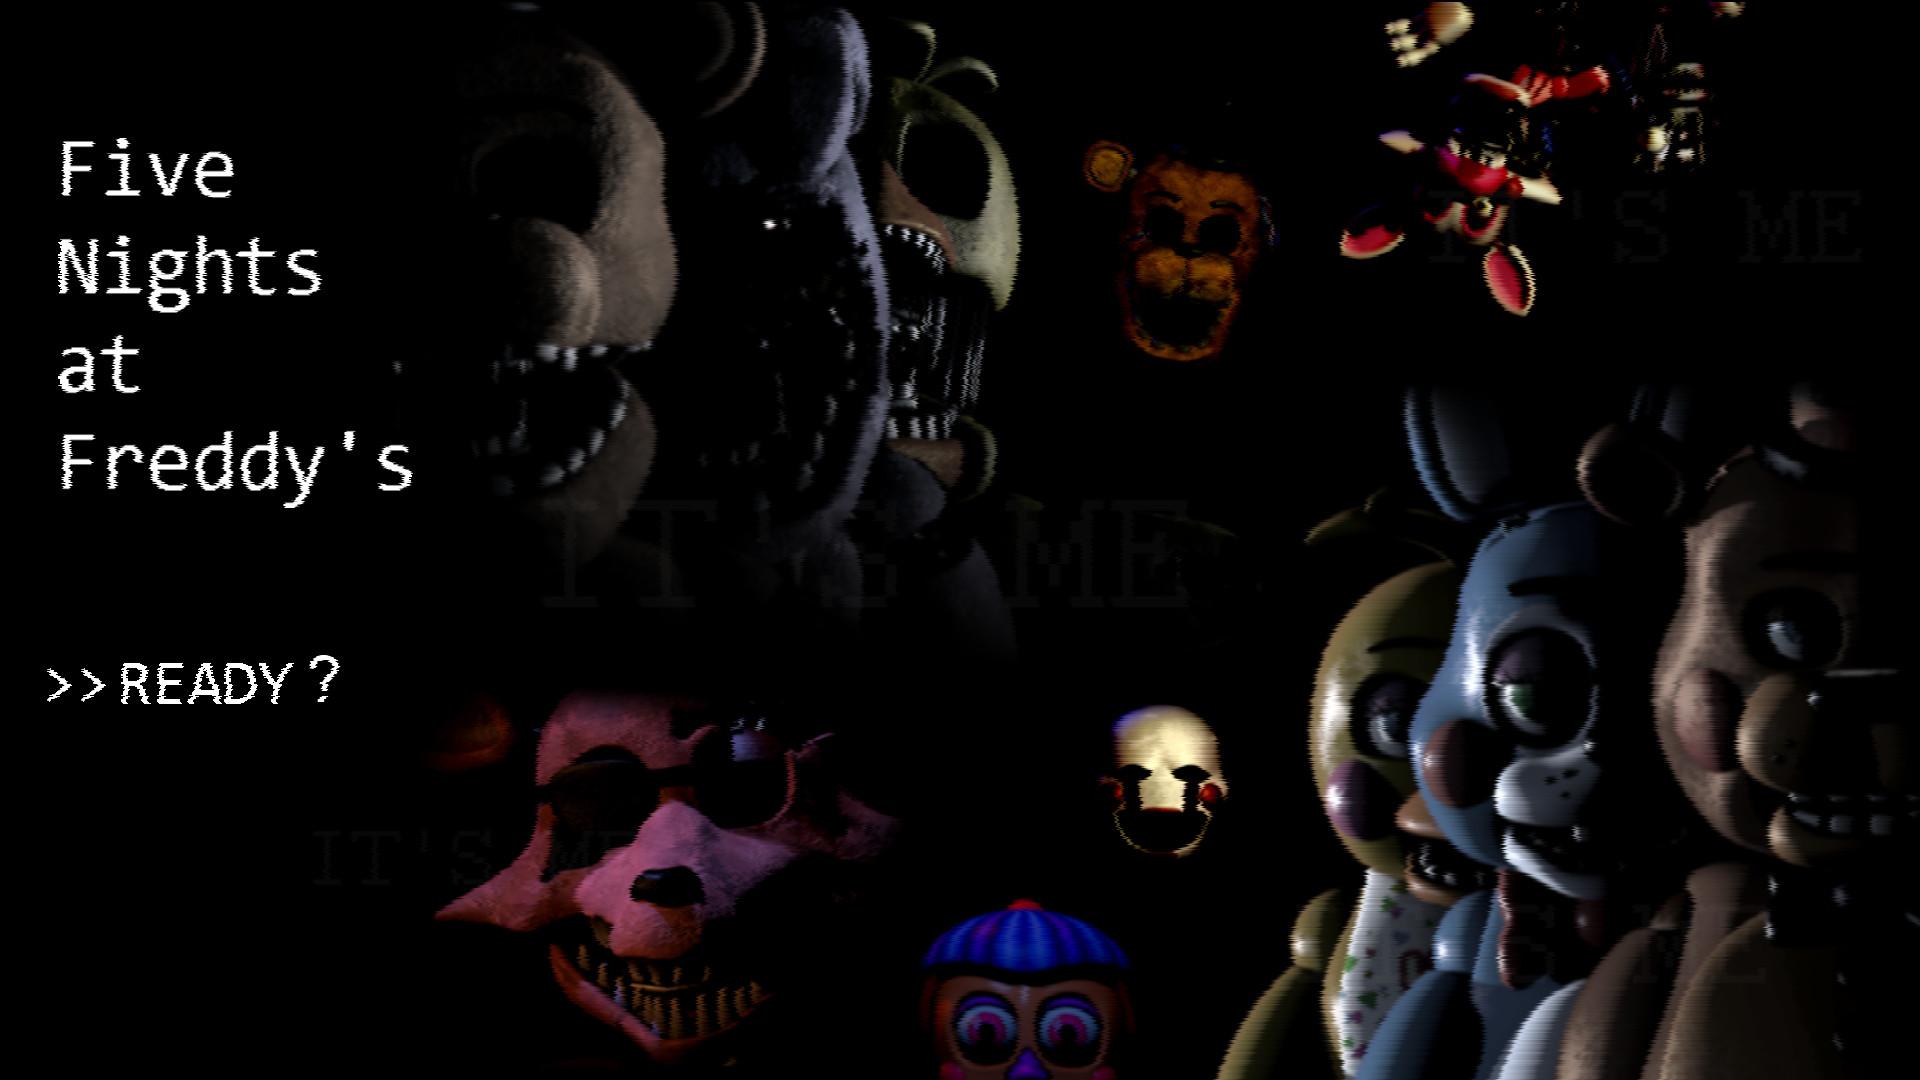 Five Nights At Freddy's Wallpaper! by ThatOnePyotr on DeviantArt